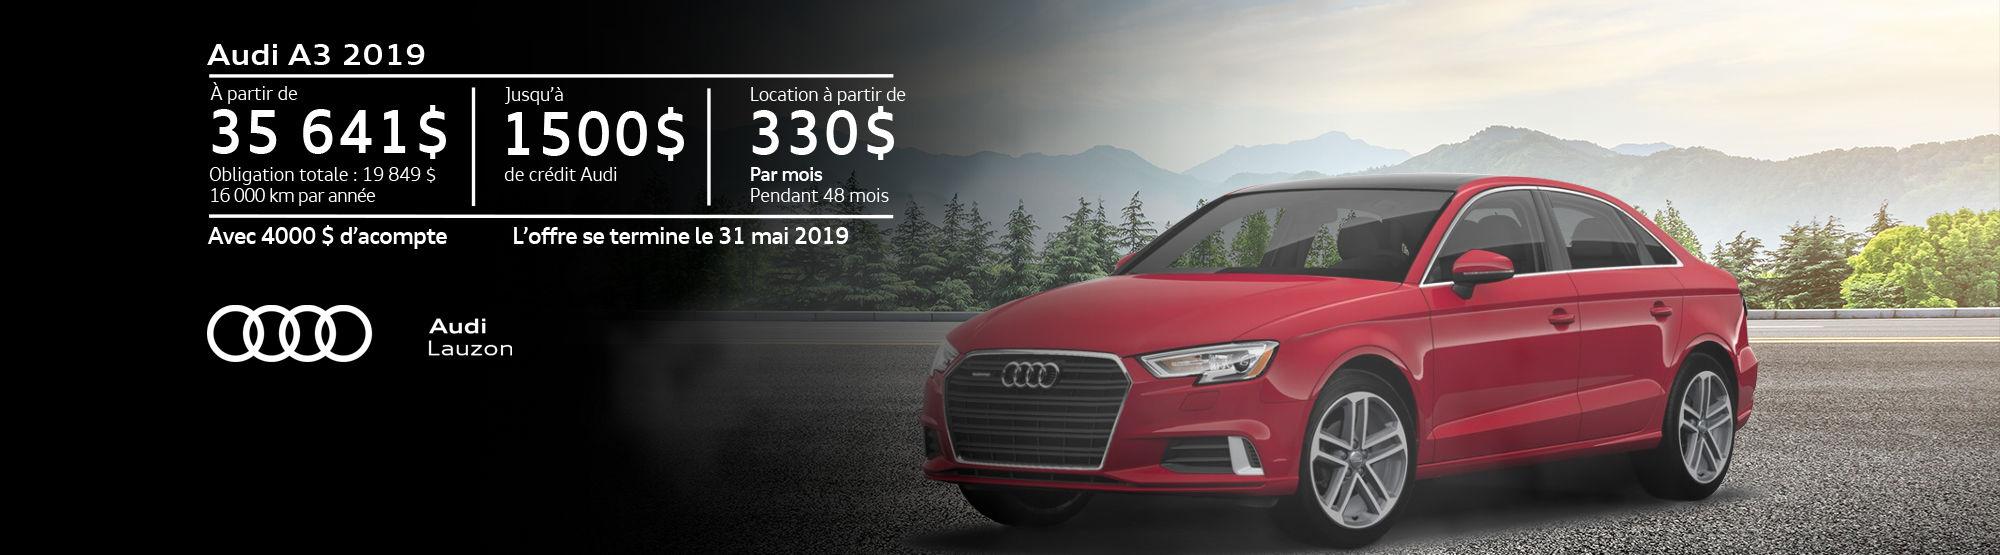 Audi A3 mai 2019